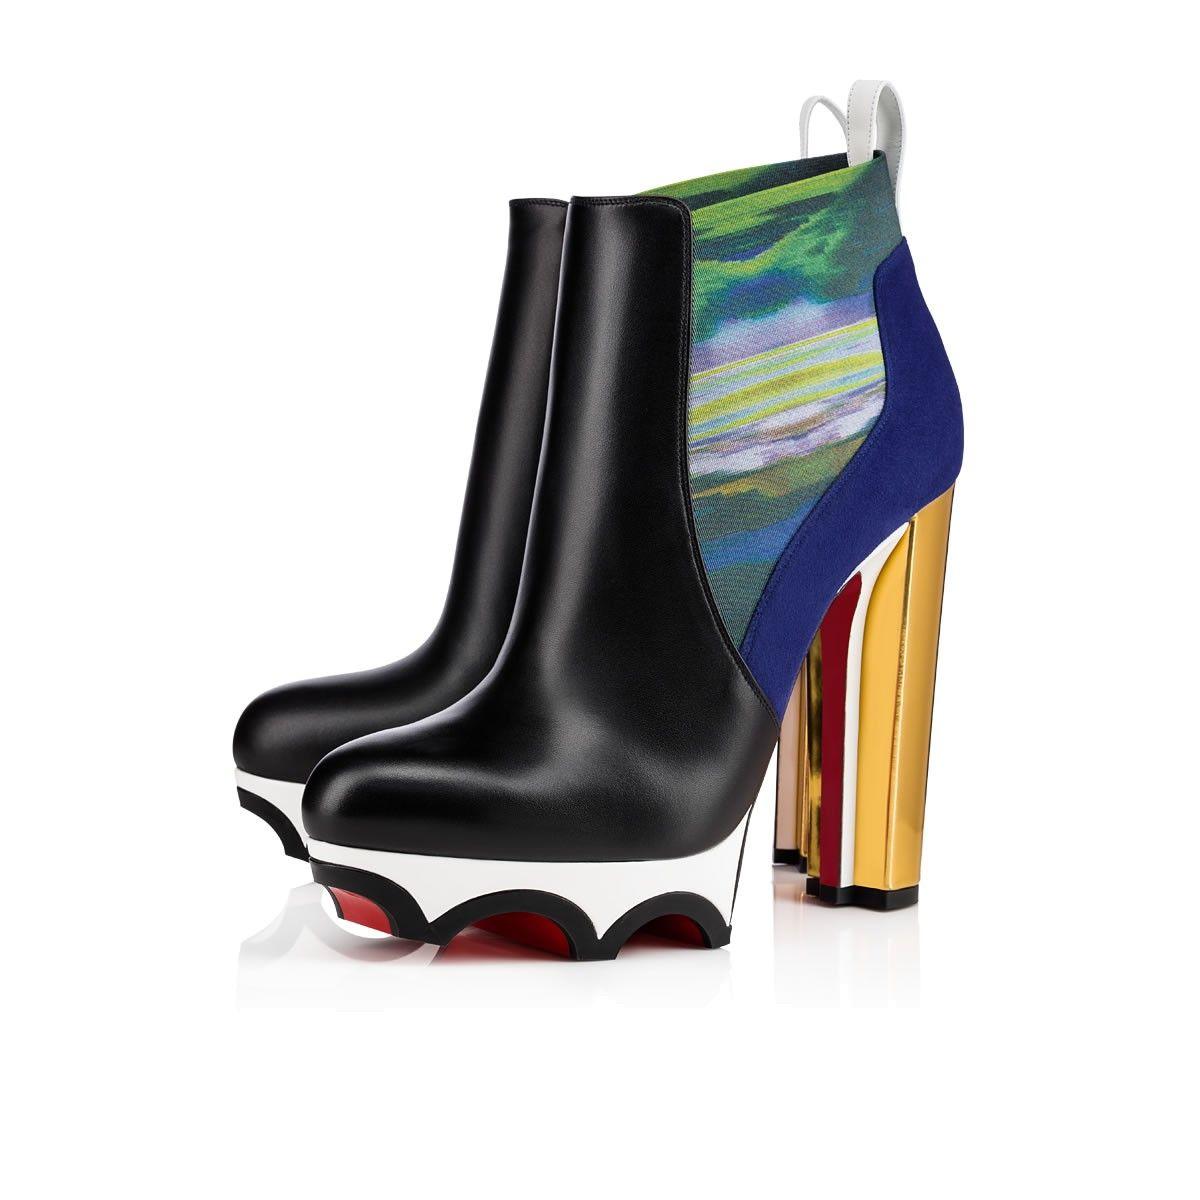 new styles b5ab6 19076 Shoes - Crampetta 140 Calf/specchio Heel - Christian ...